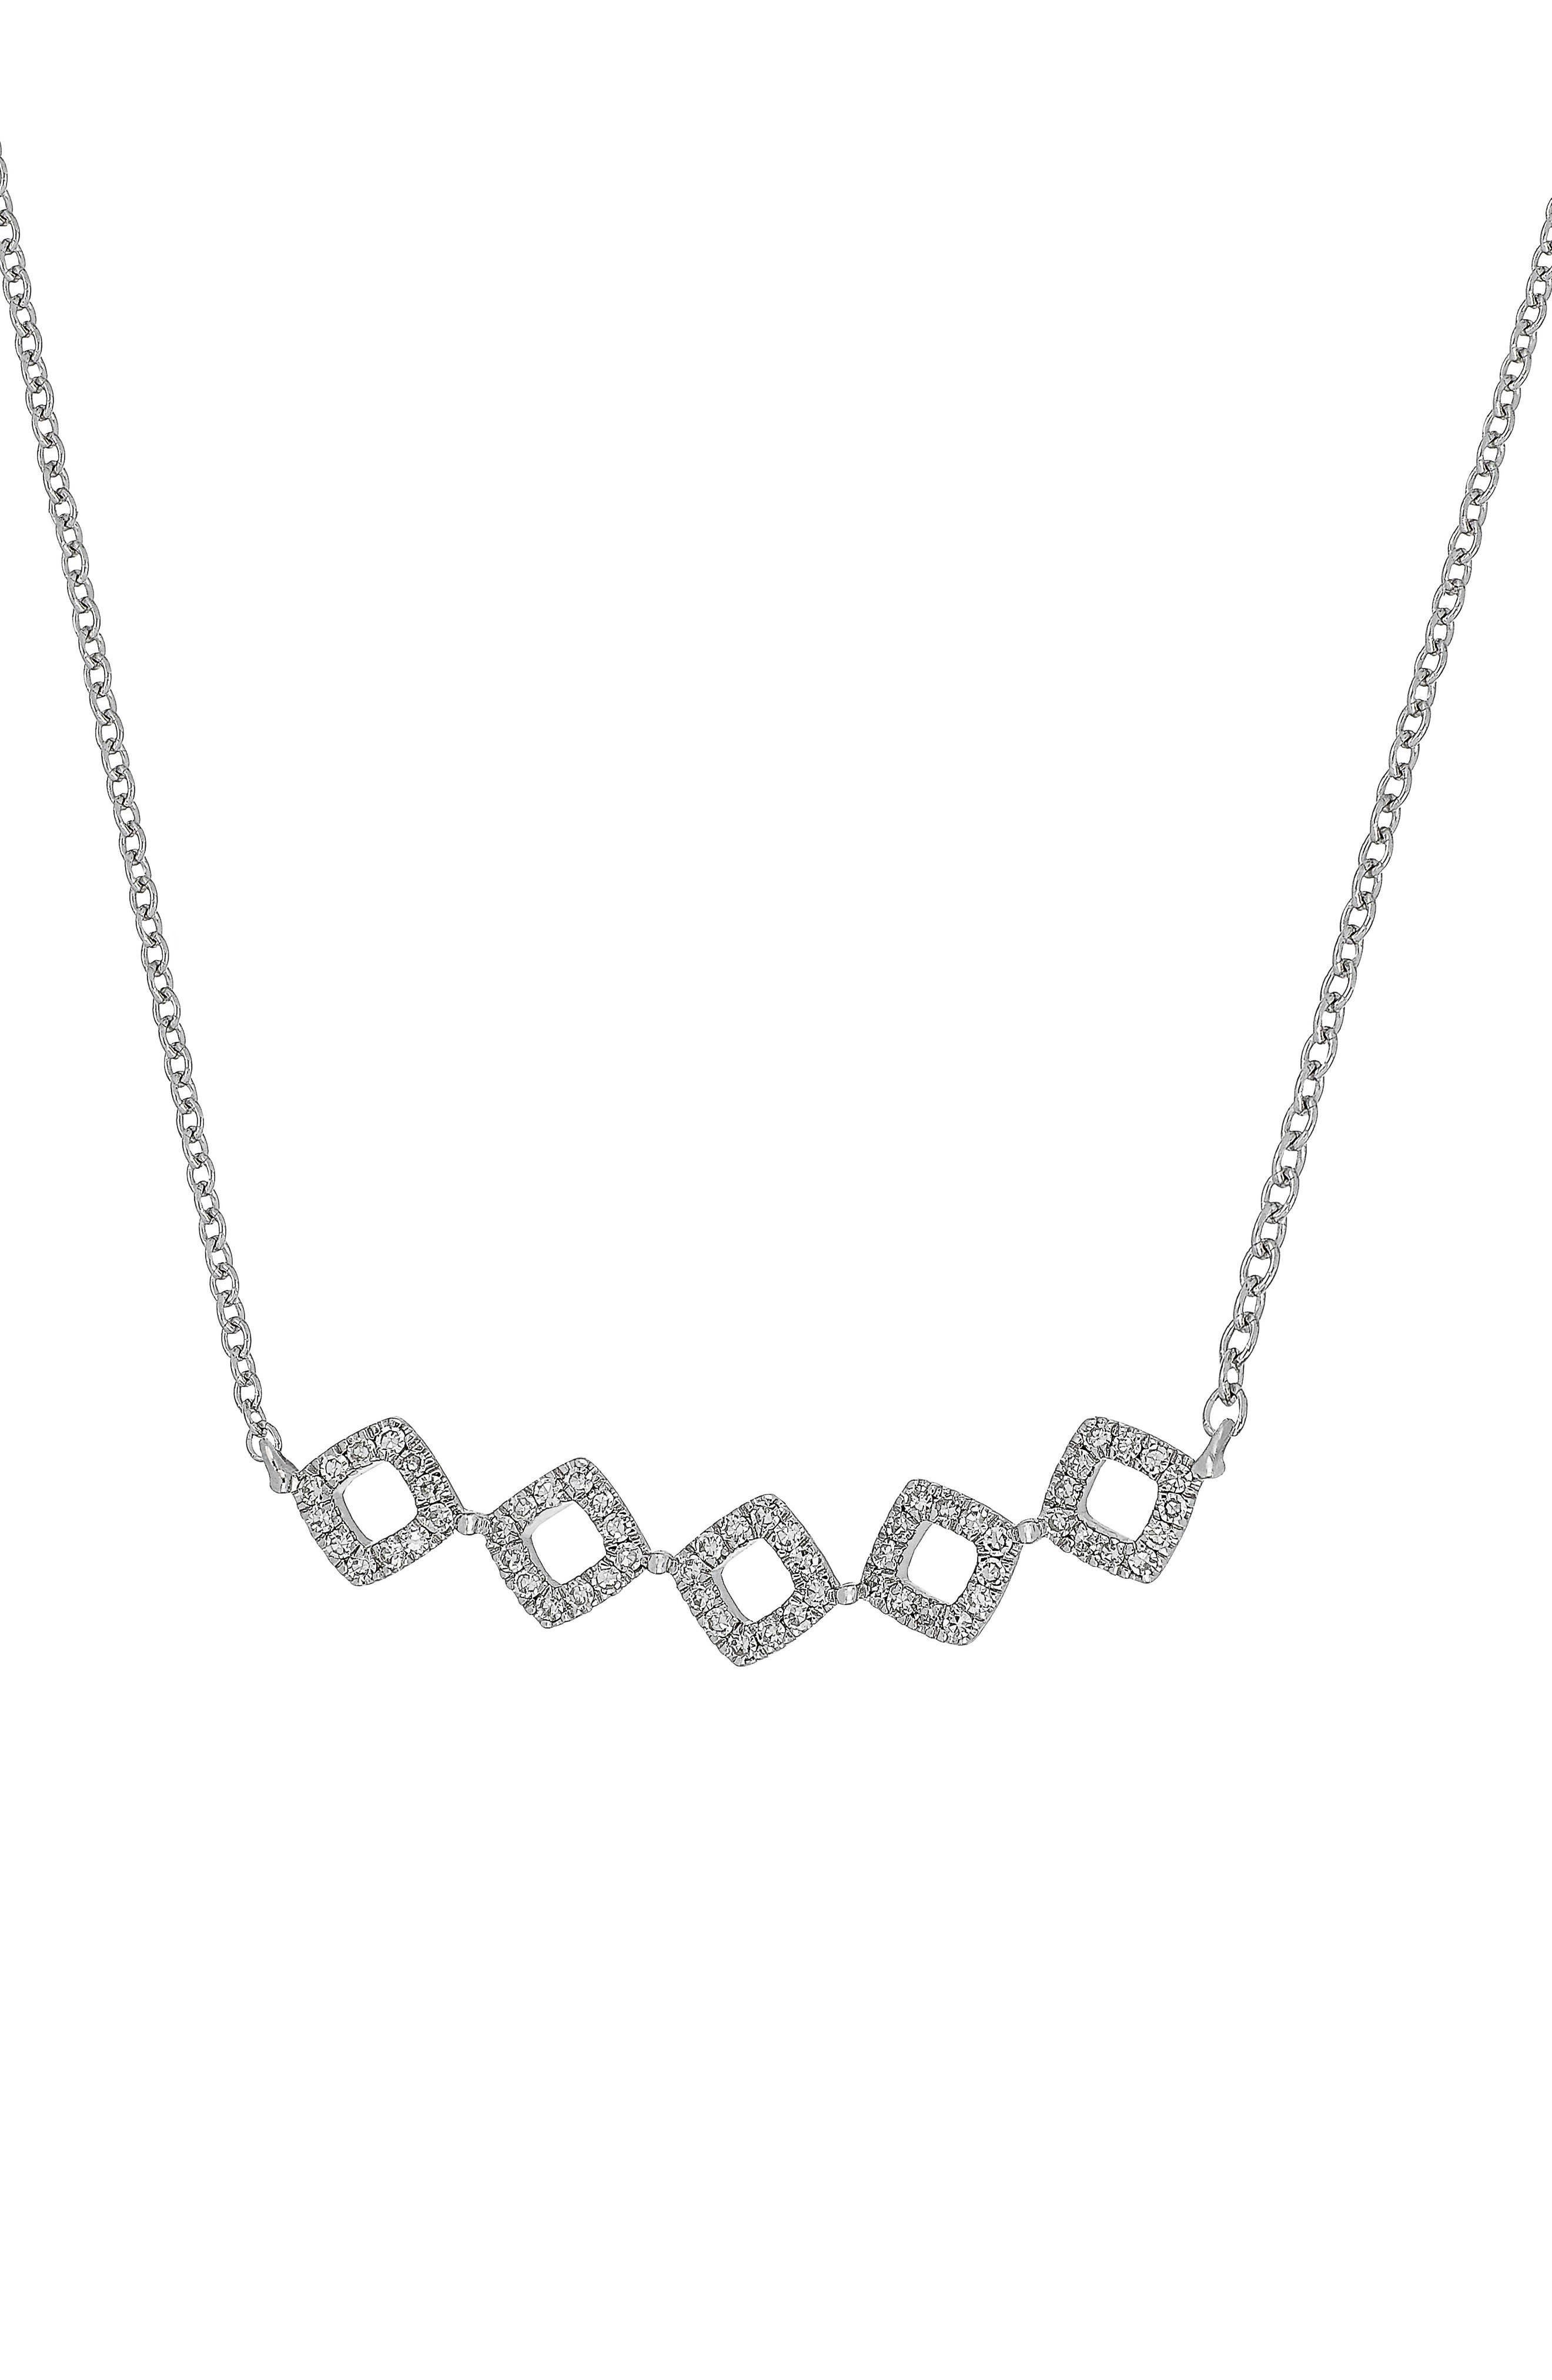 Carrière Diamond Shape Frontal Necklace,                             Main thumbnail 1, color,                             SILVER/ DIAMOND